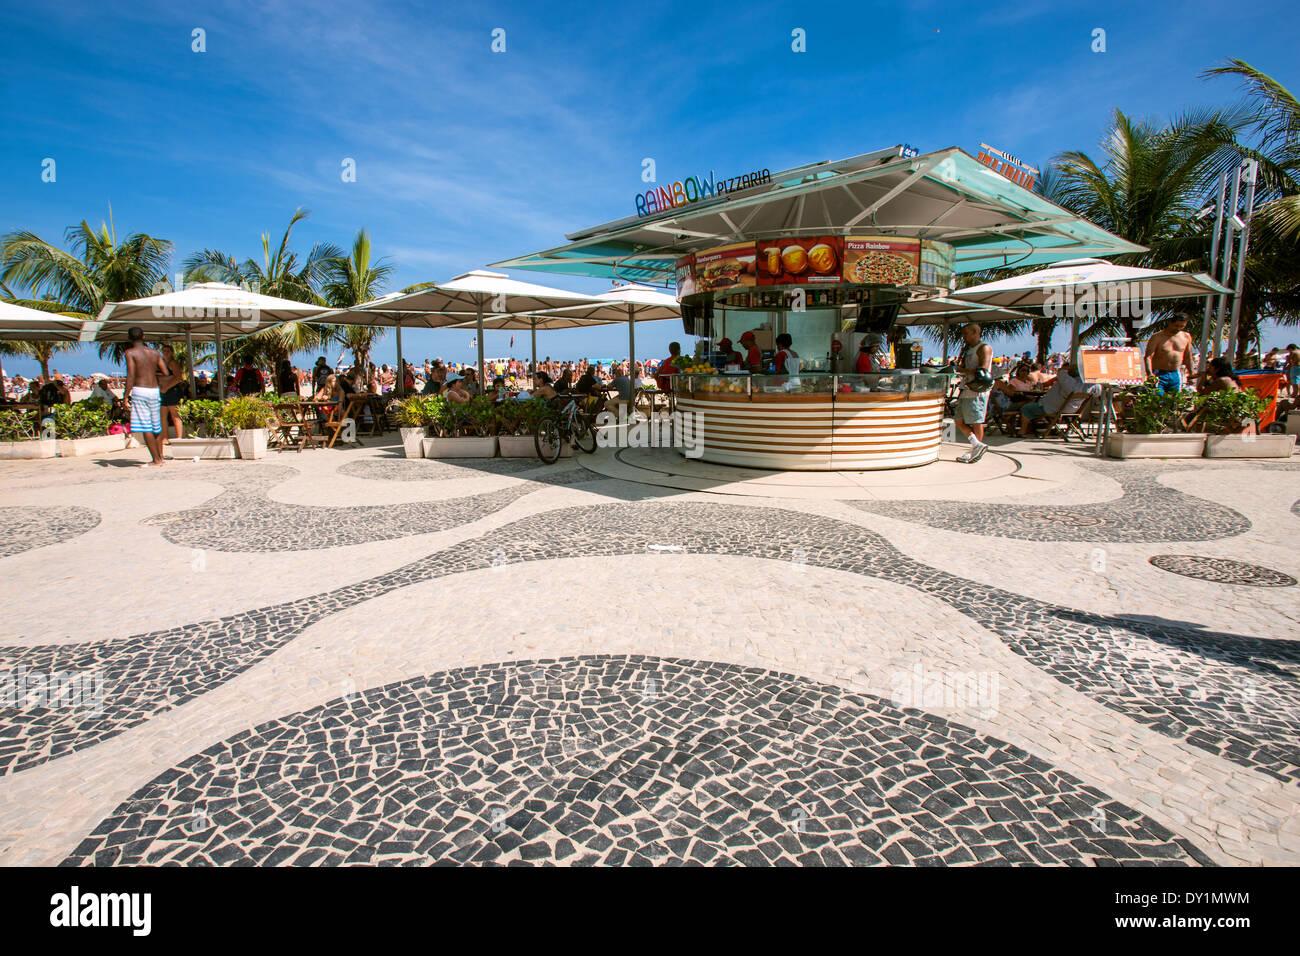 Rio de Janeiro, Copacabana, Avenida Atlantica, mosaic of Roberto Burle Marx, beach bar, people, Brasil - Stock Image